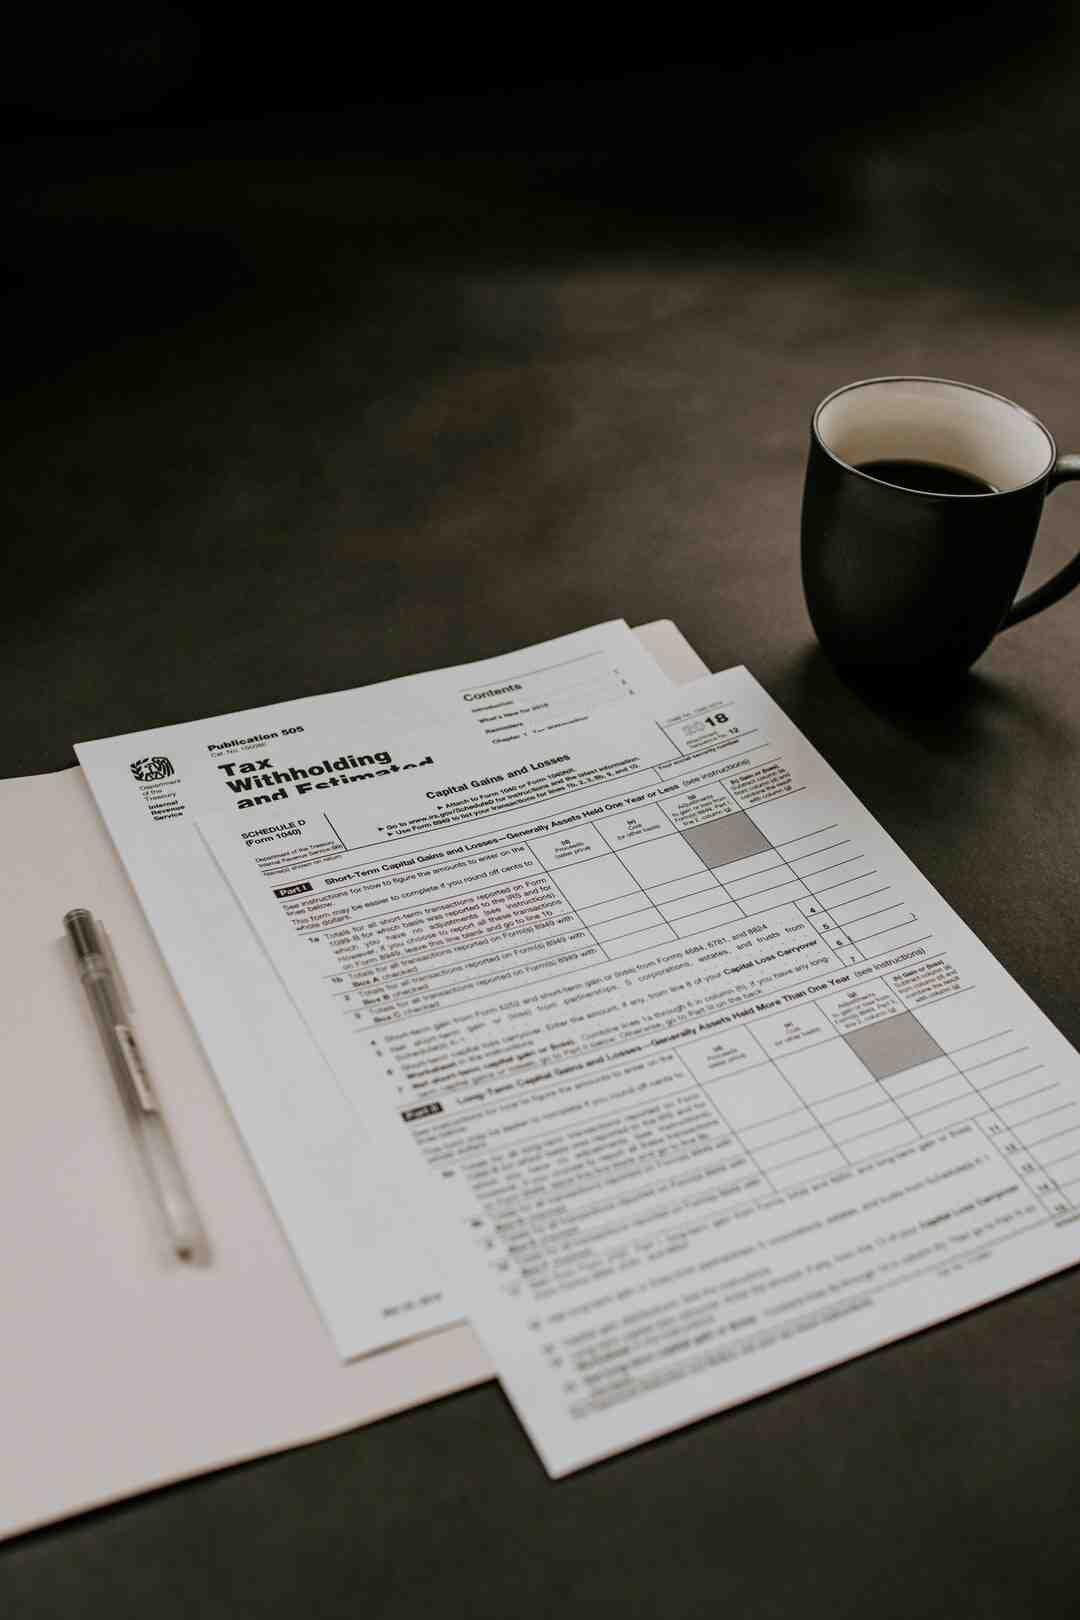 Do accountants make more than doctors?